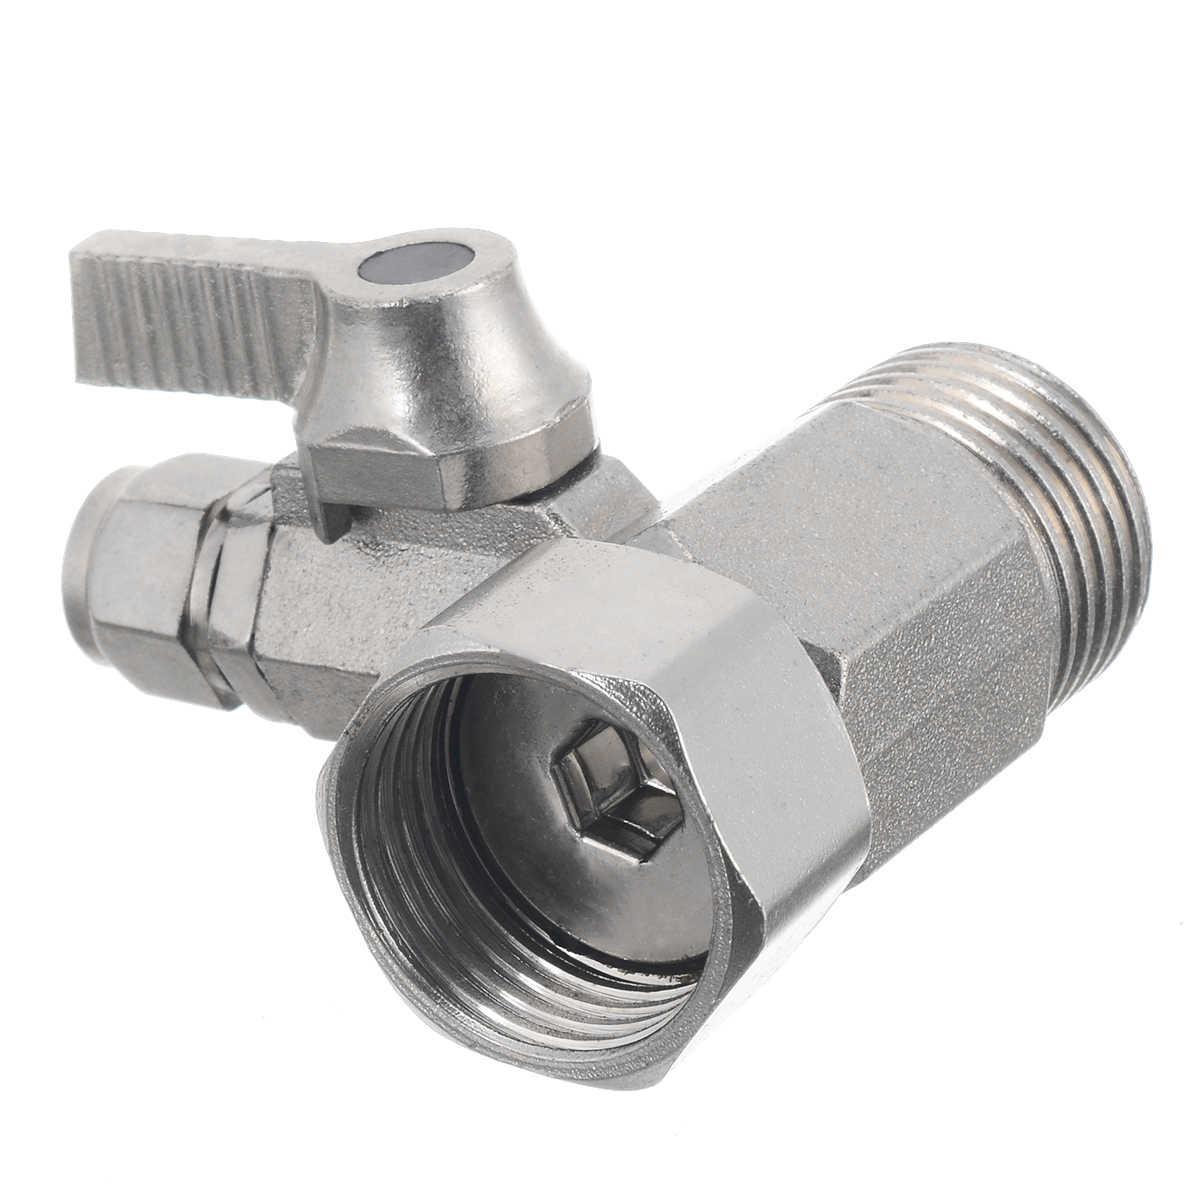 V/álvula de bola adaptador de filtro de agua de 1//2 a 1//4 pulgadas interruptor de /ósmosis inversa